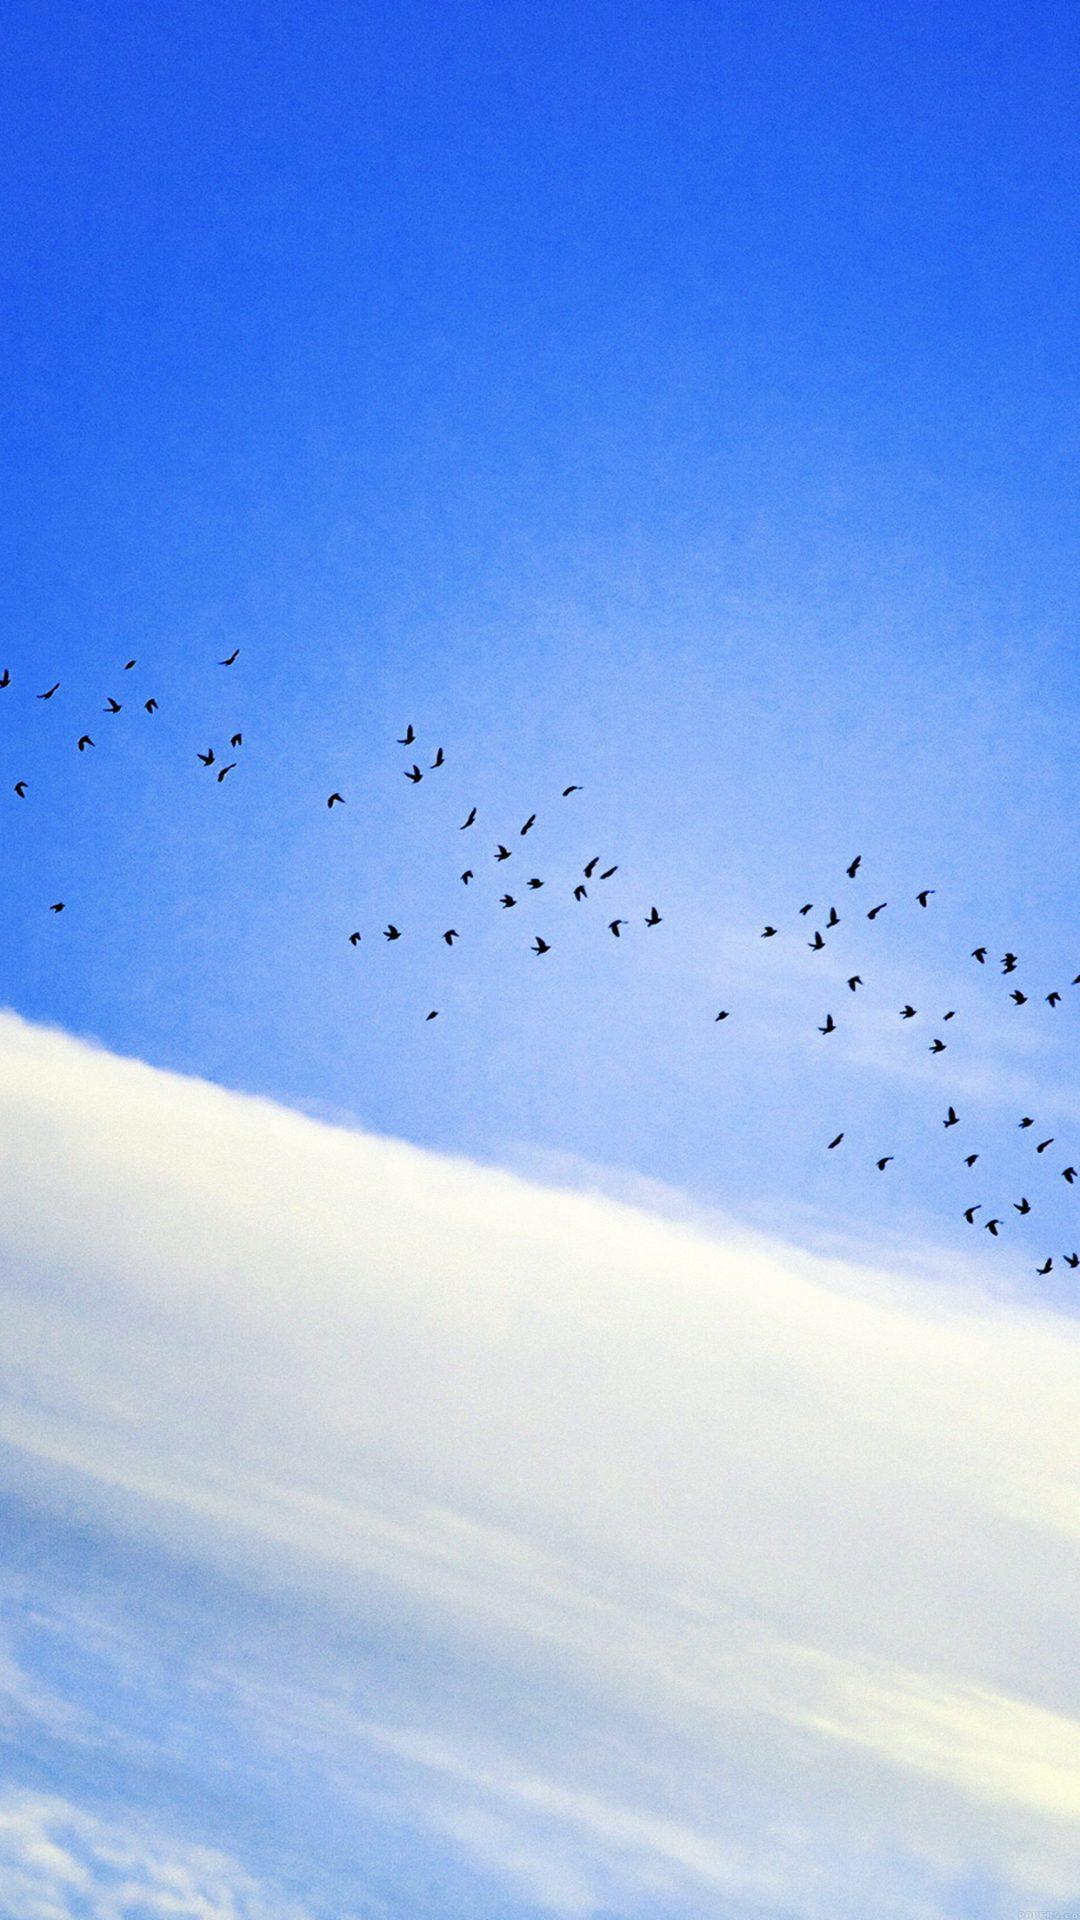 Sky Cloud Birds Blue Fly Nature